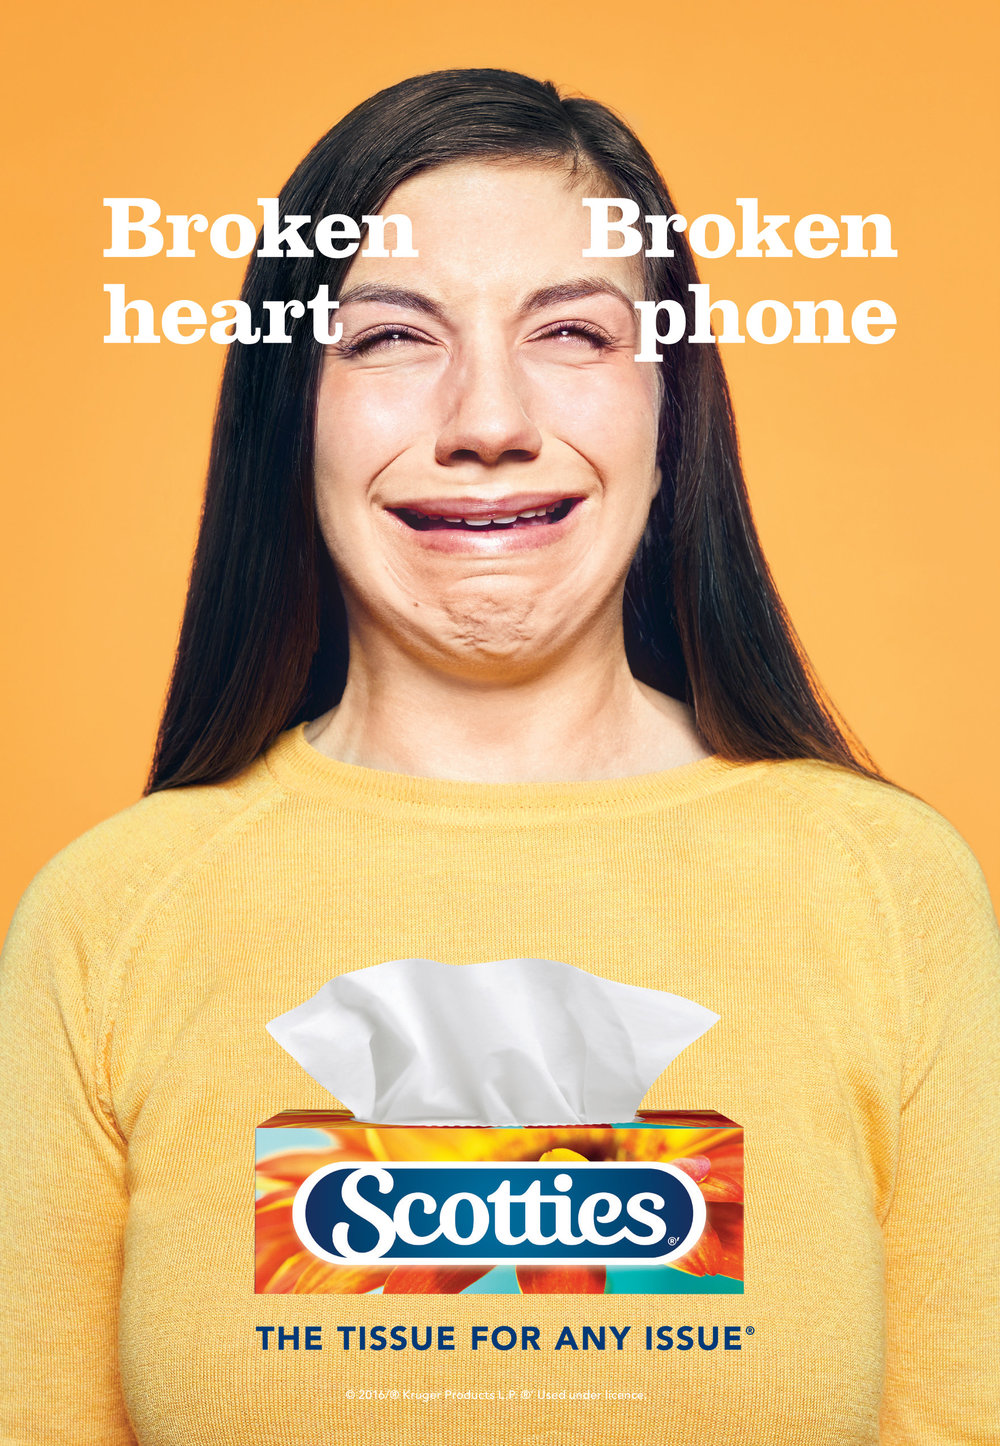 SCOTTIES1.jpg